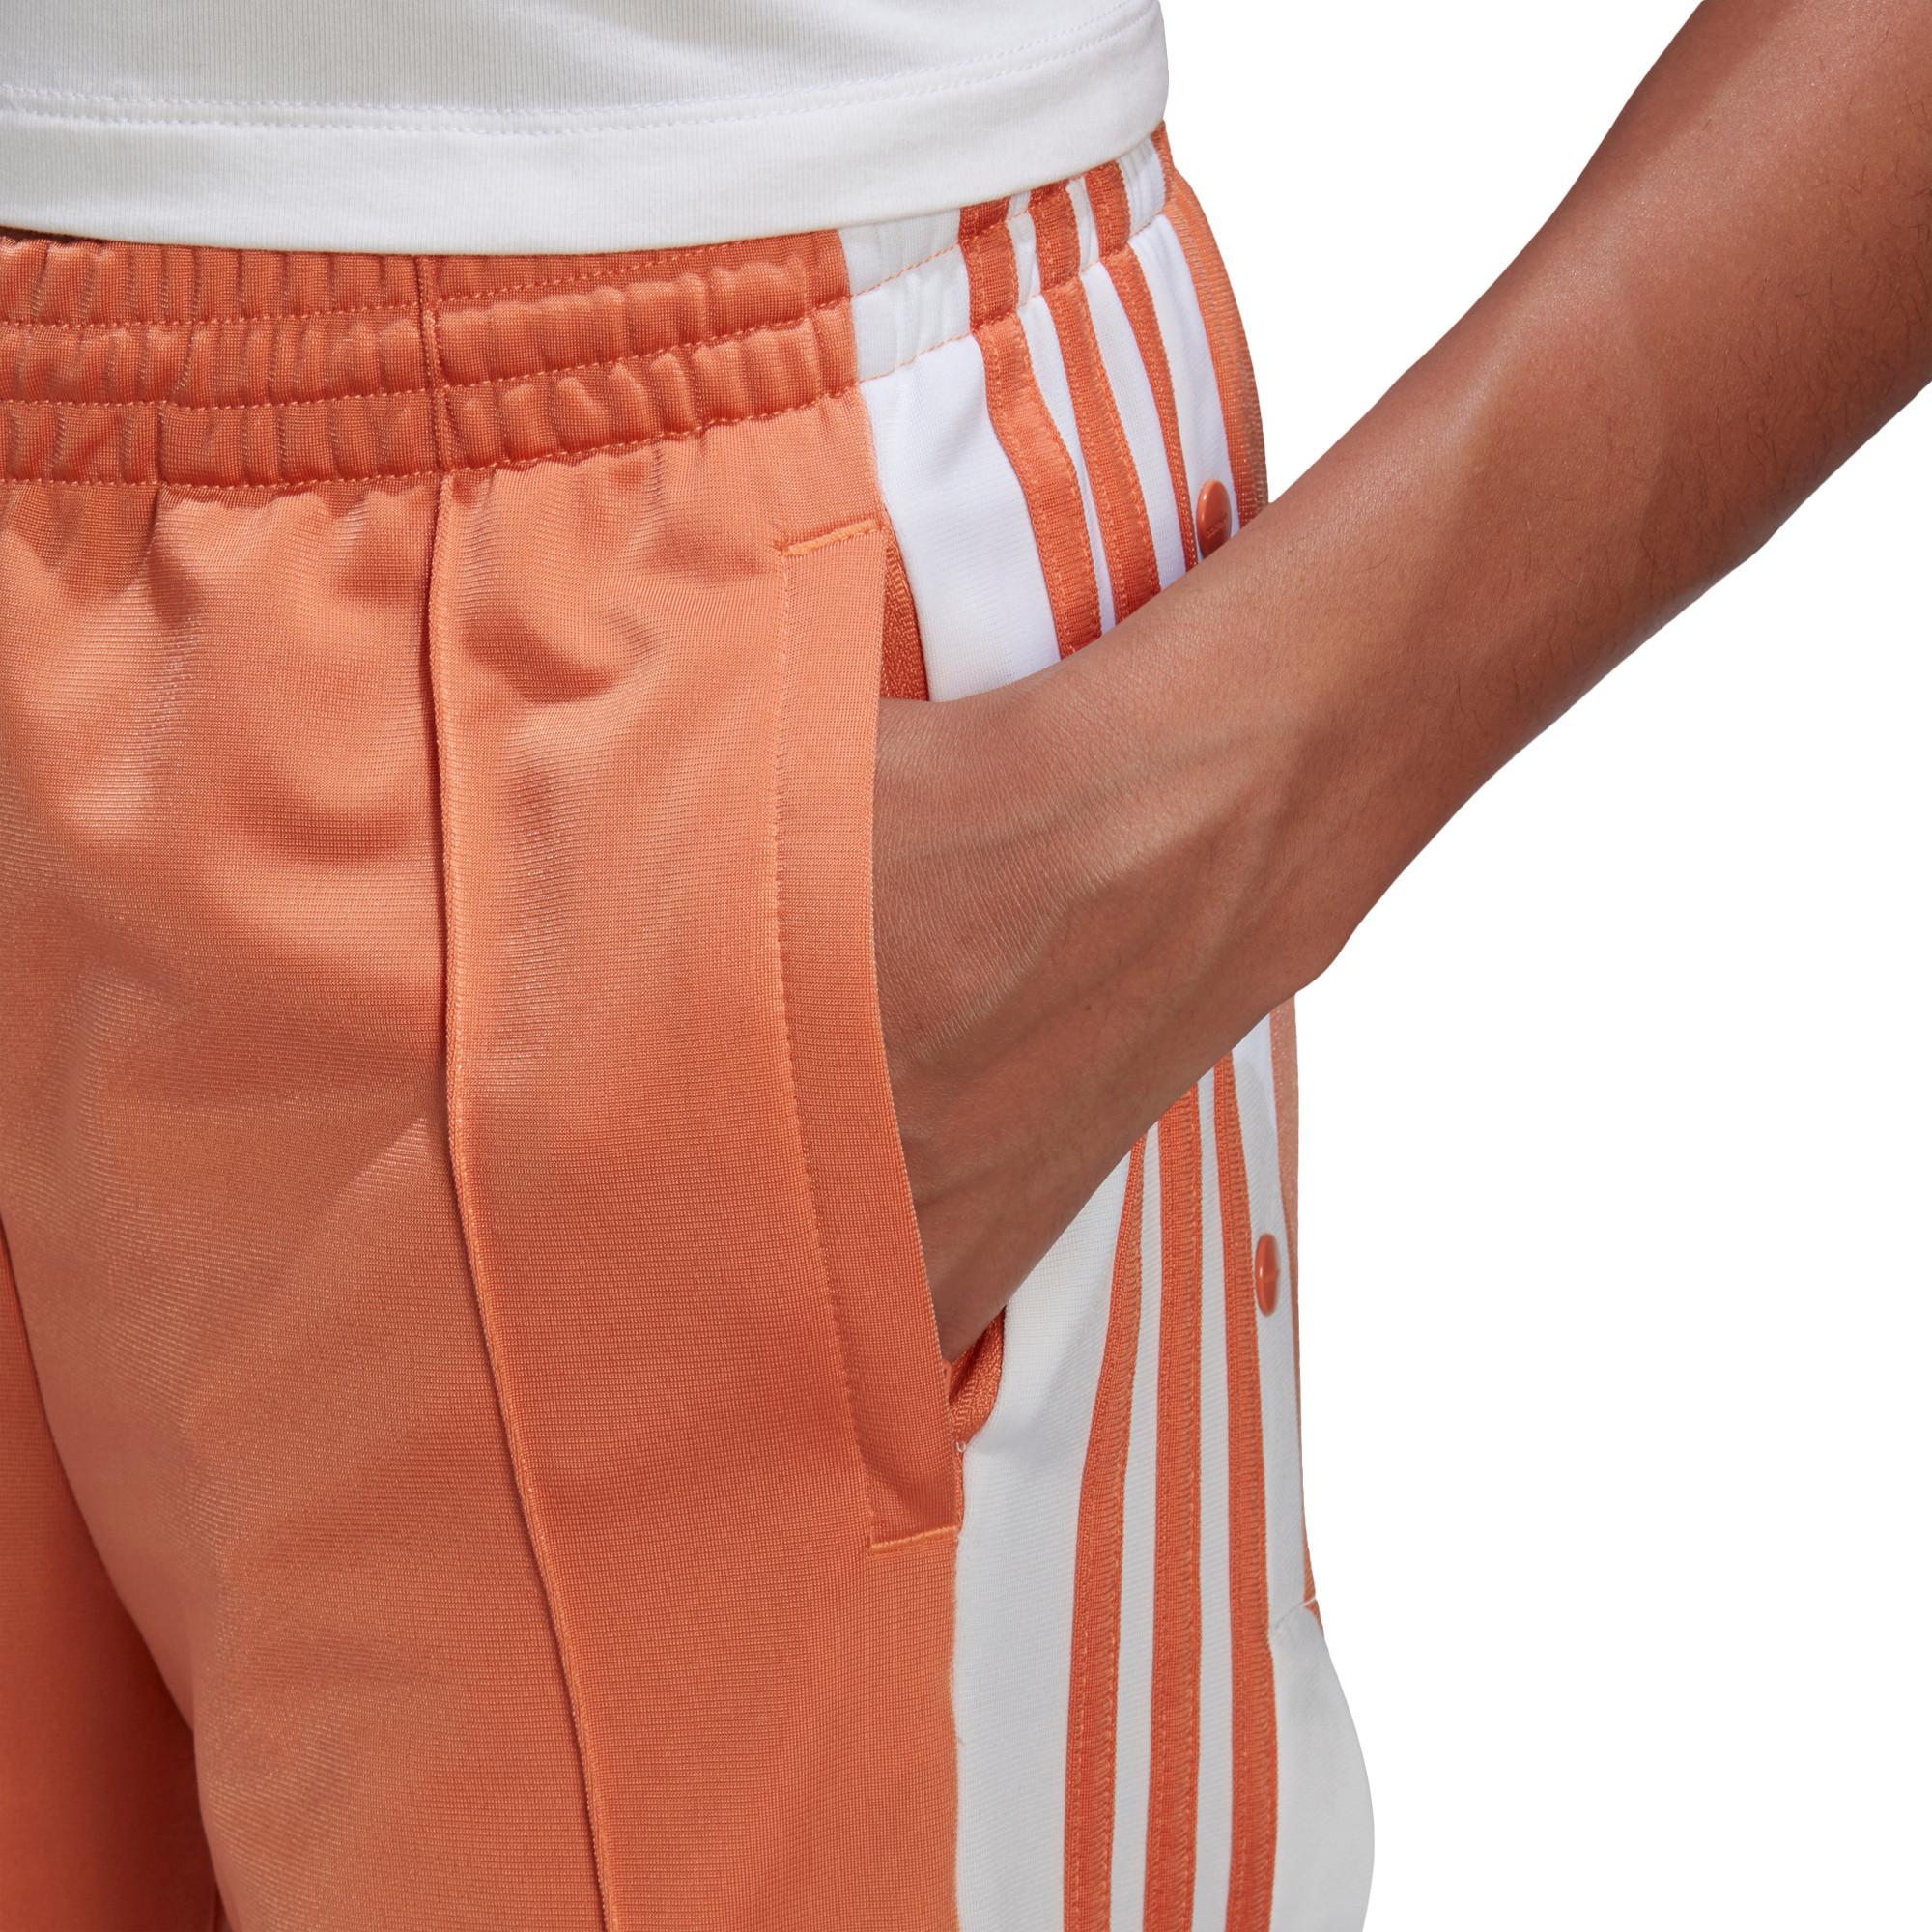 Pantaloni tuta adicolor Classics adibreak, Marrone bronzo, large image number 6